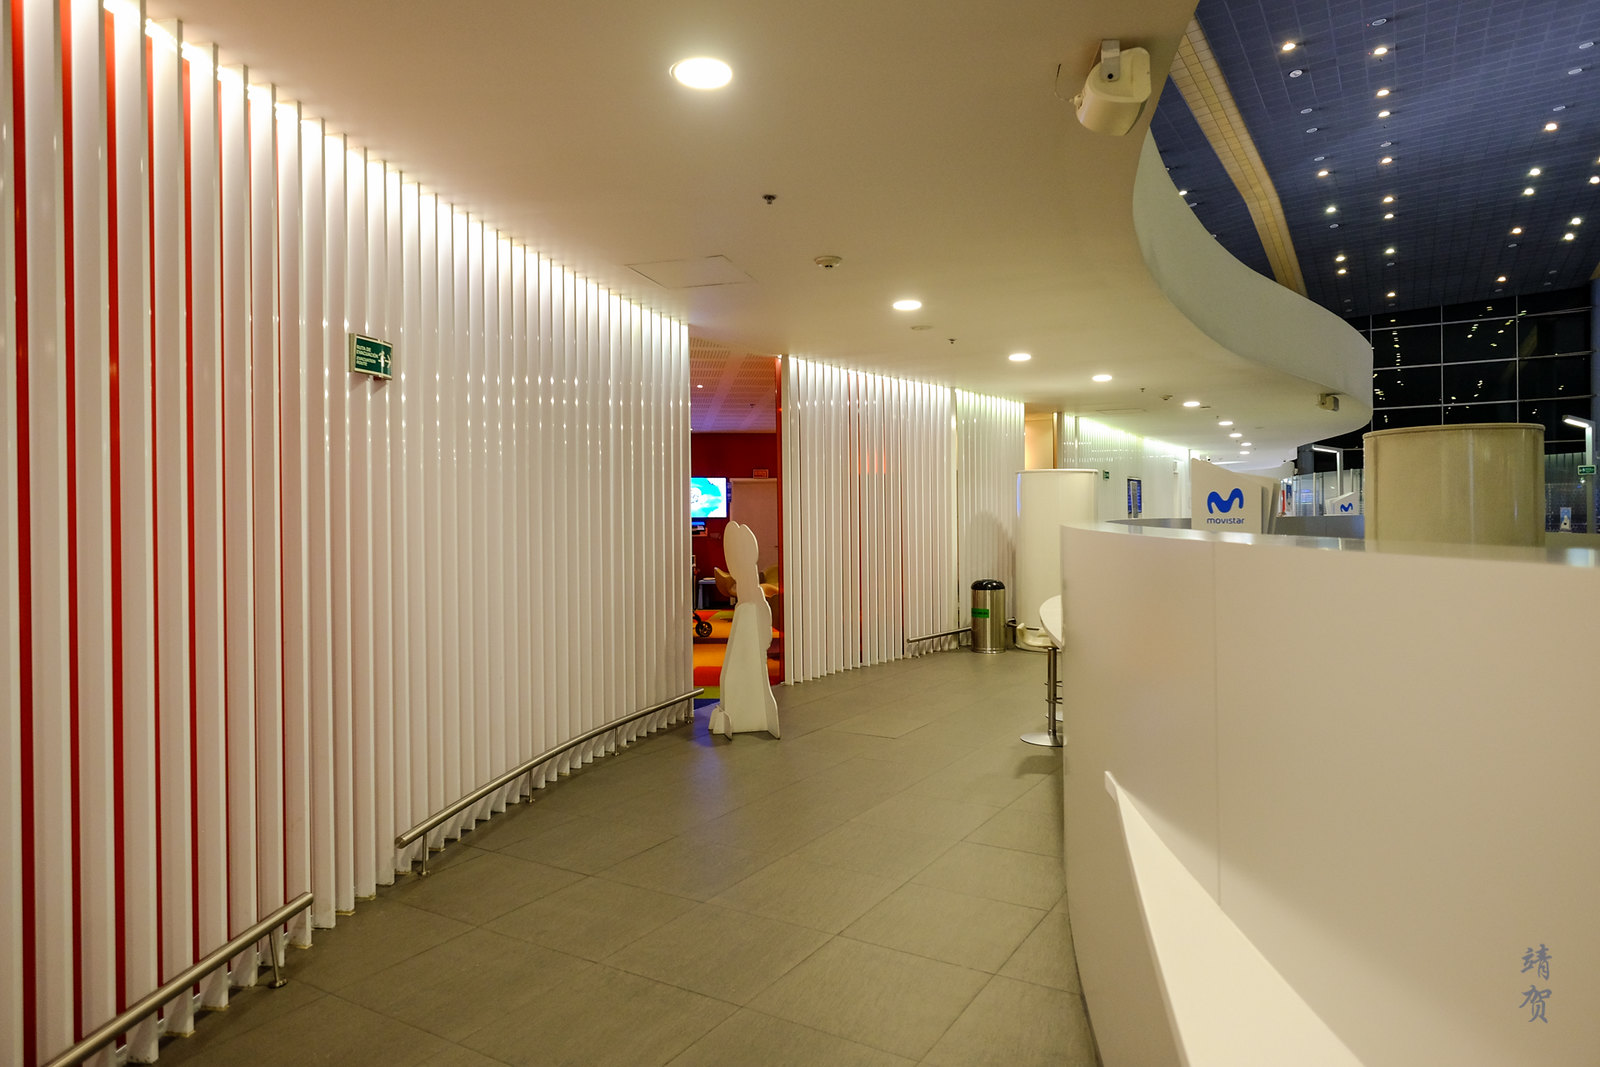 Walkway in the lounge